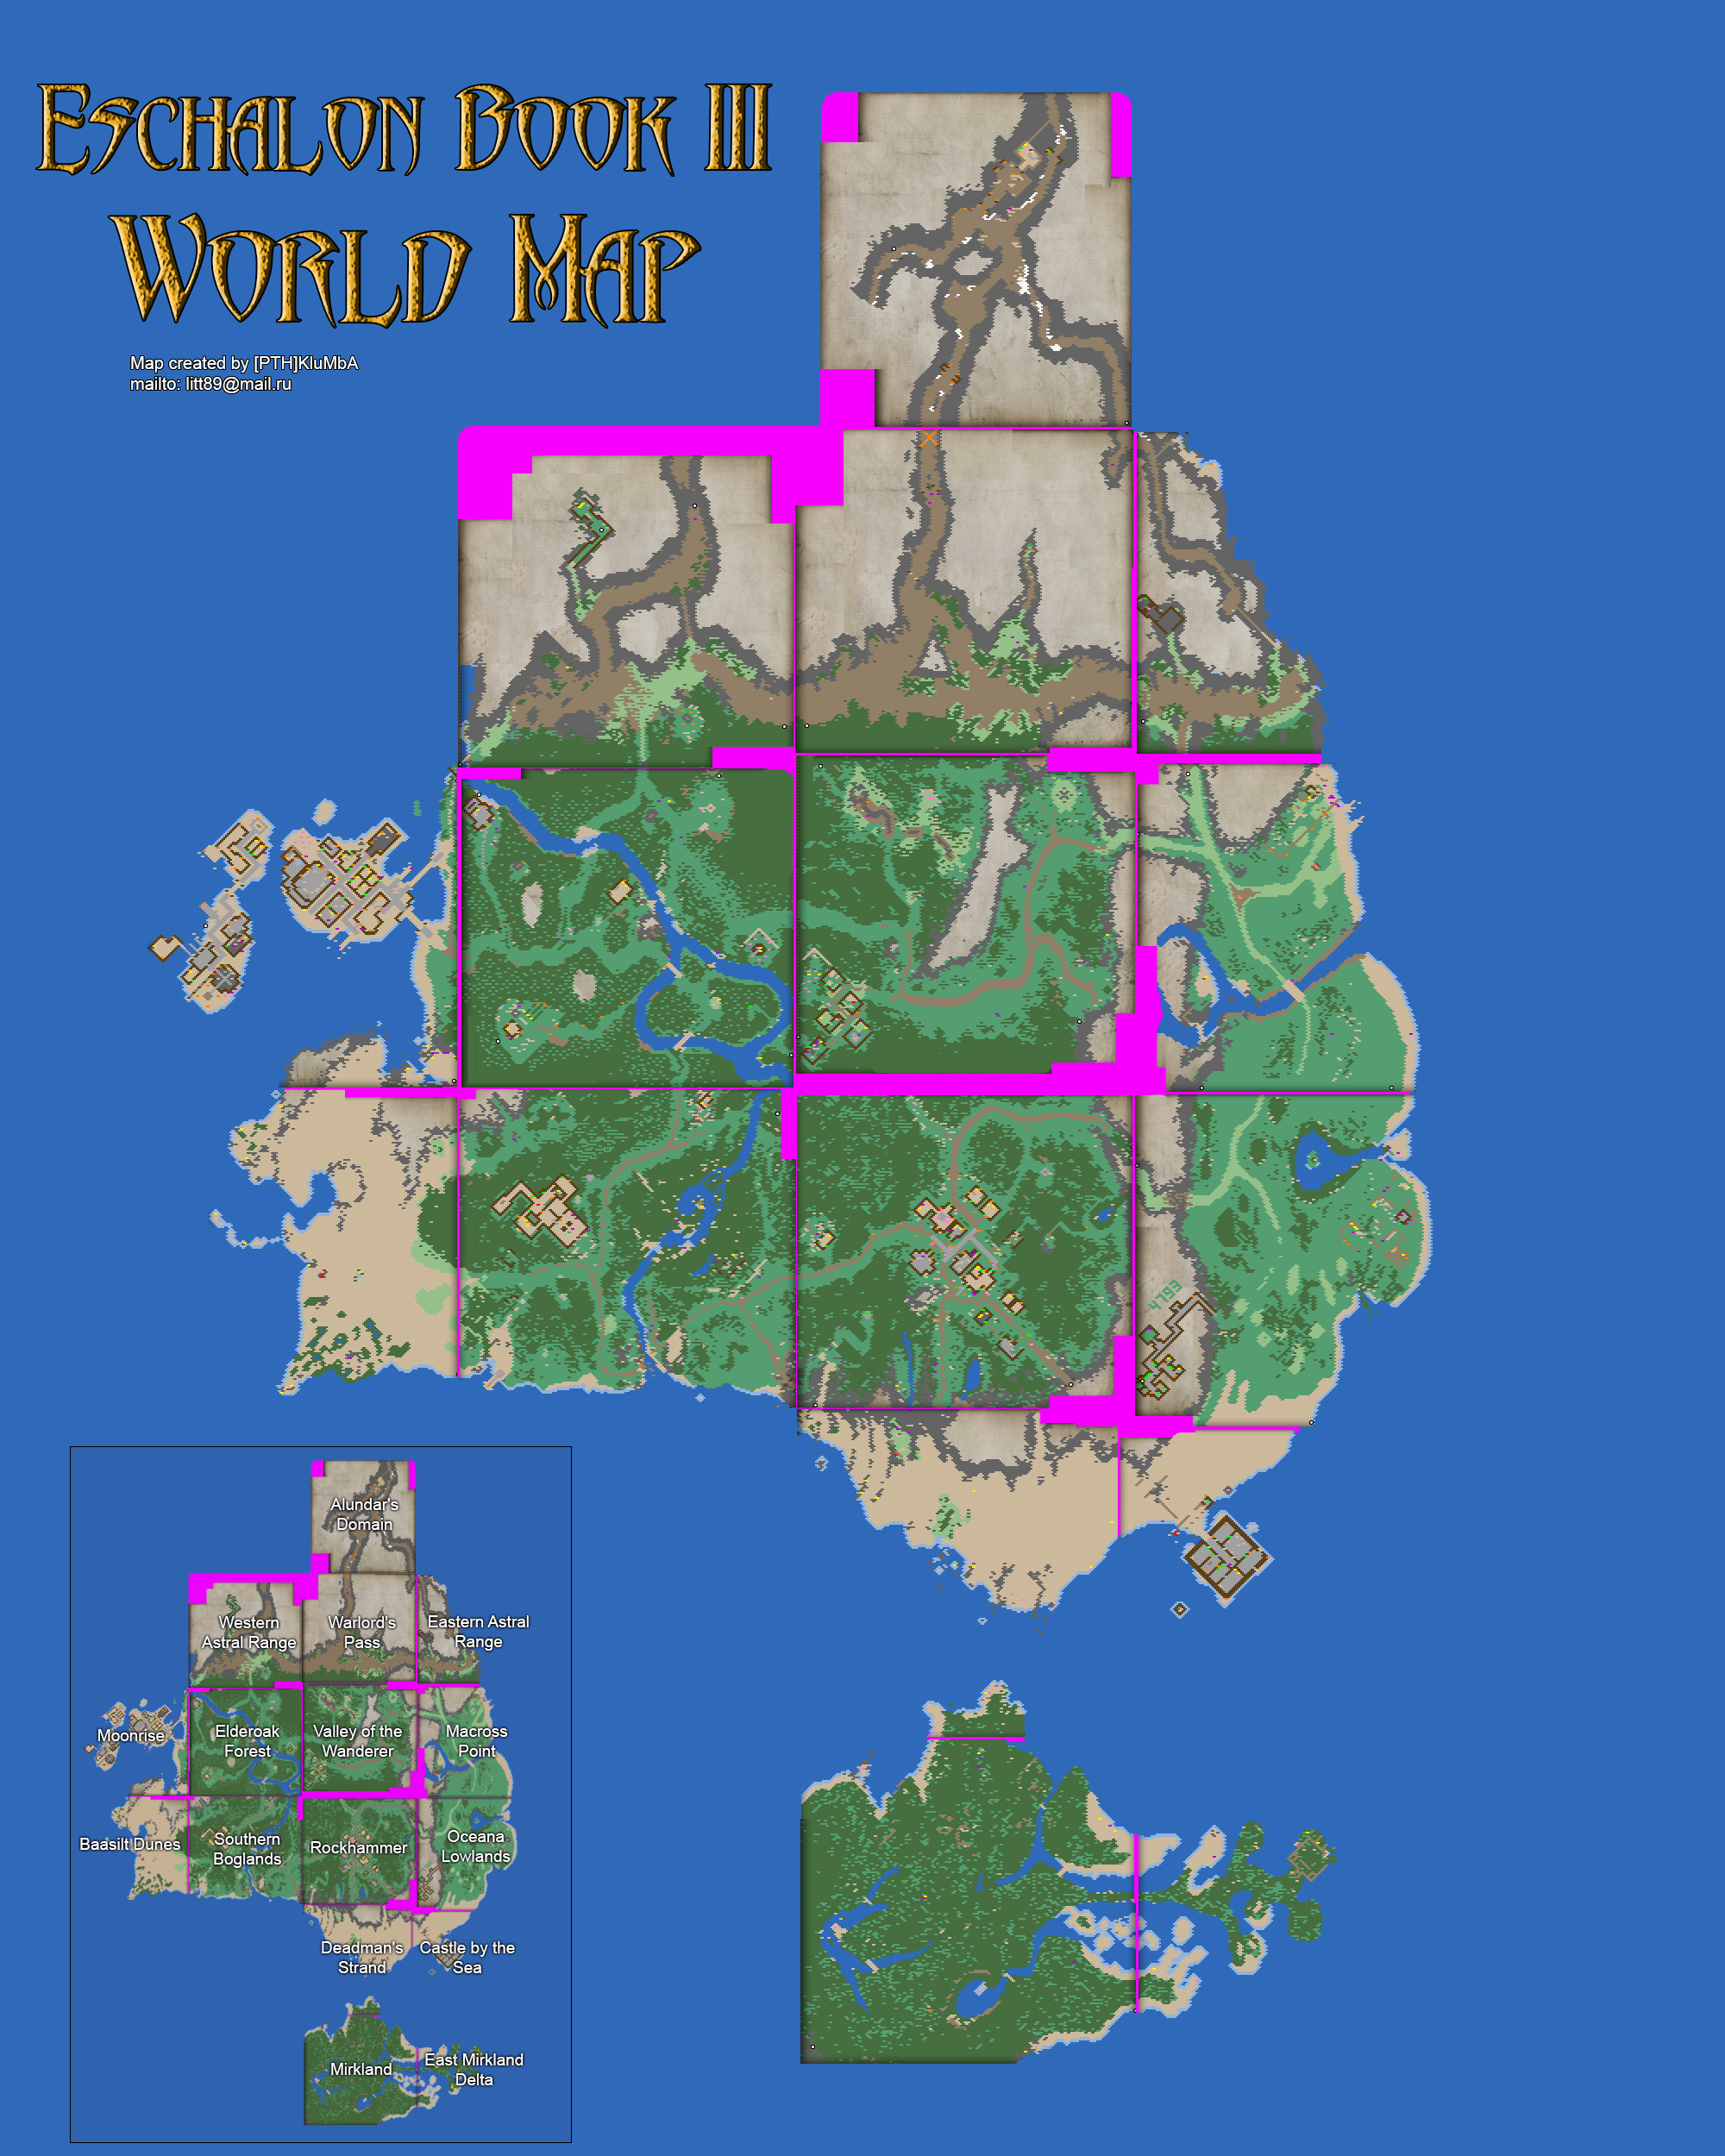 Eschalon book 3 world map eschalon rpg wiki fandom powered by wikia eschalon book 3 world map gumiabroncs Choice Image